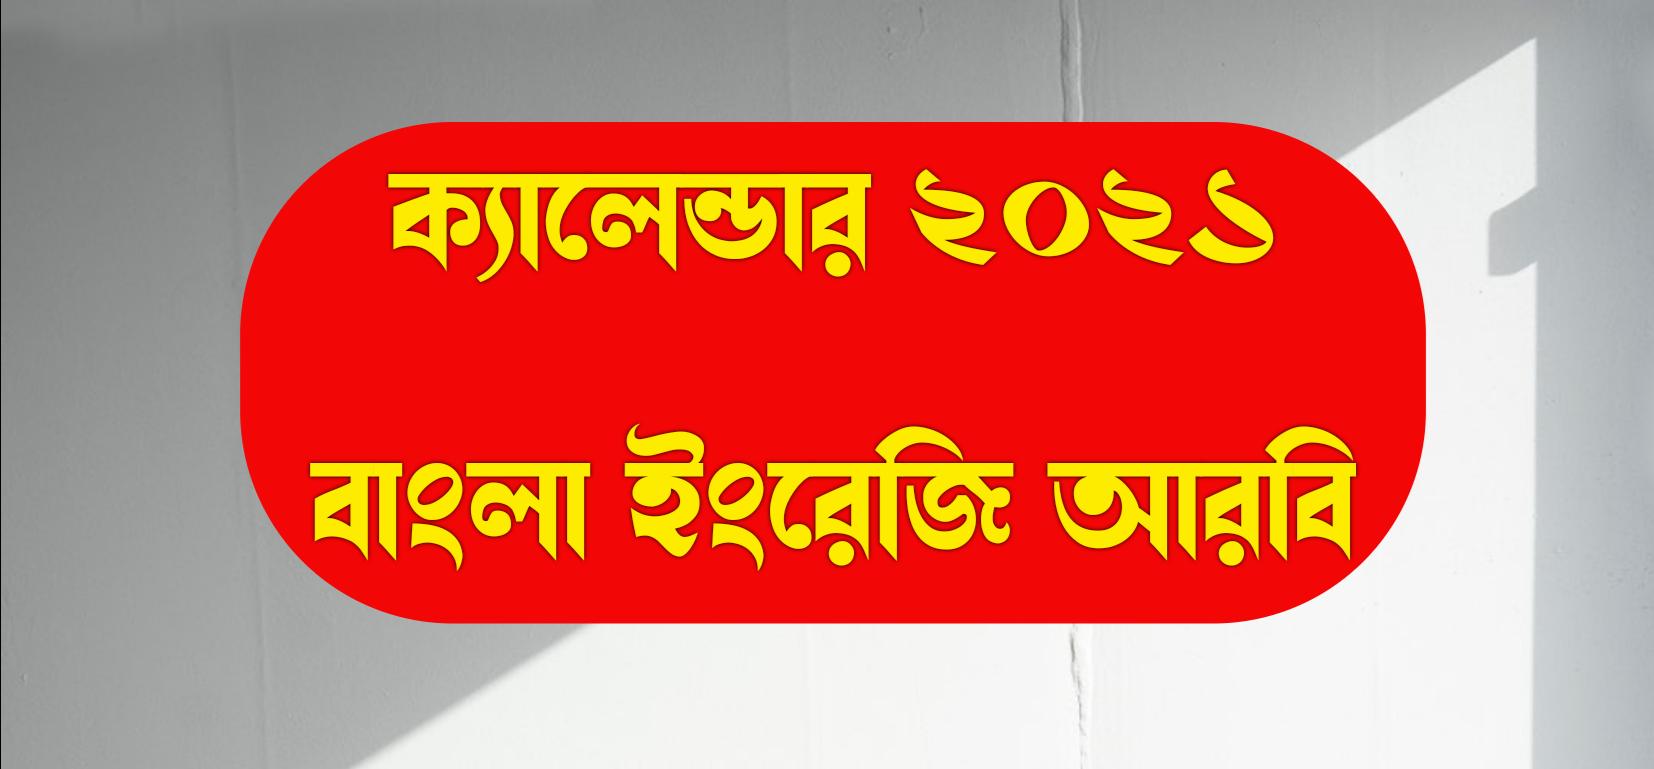 Bengali Arabi English Calendar 2021 PDF | ২০২১ সালের বাংলা ইংরেজি আরবি ক্যালেন্ডার পিডিএফ | বাংলা ইংরেজি আরবি ক্যালেন্ডার ২০২১ pdf Download